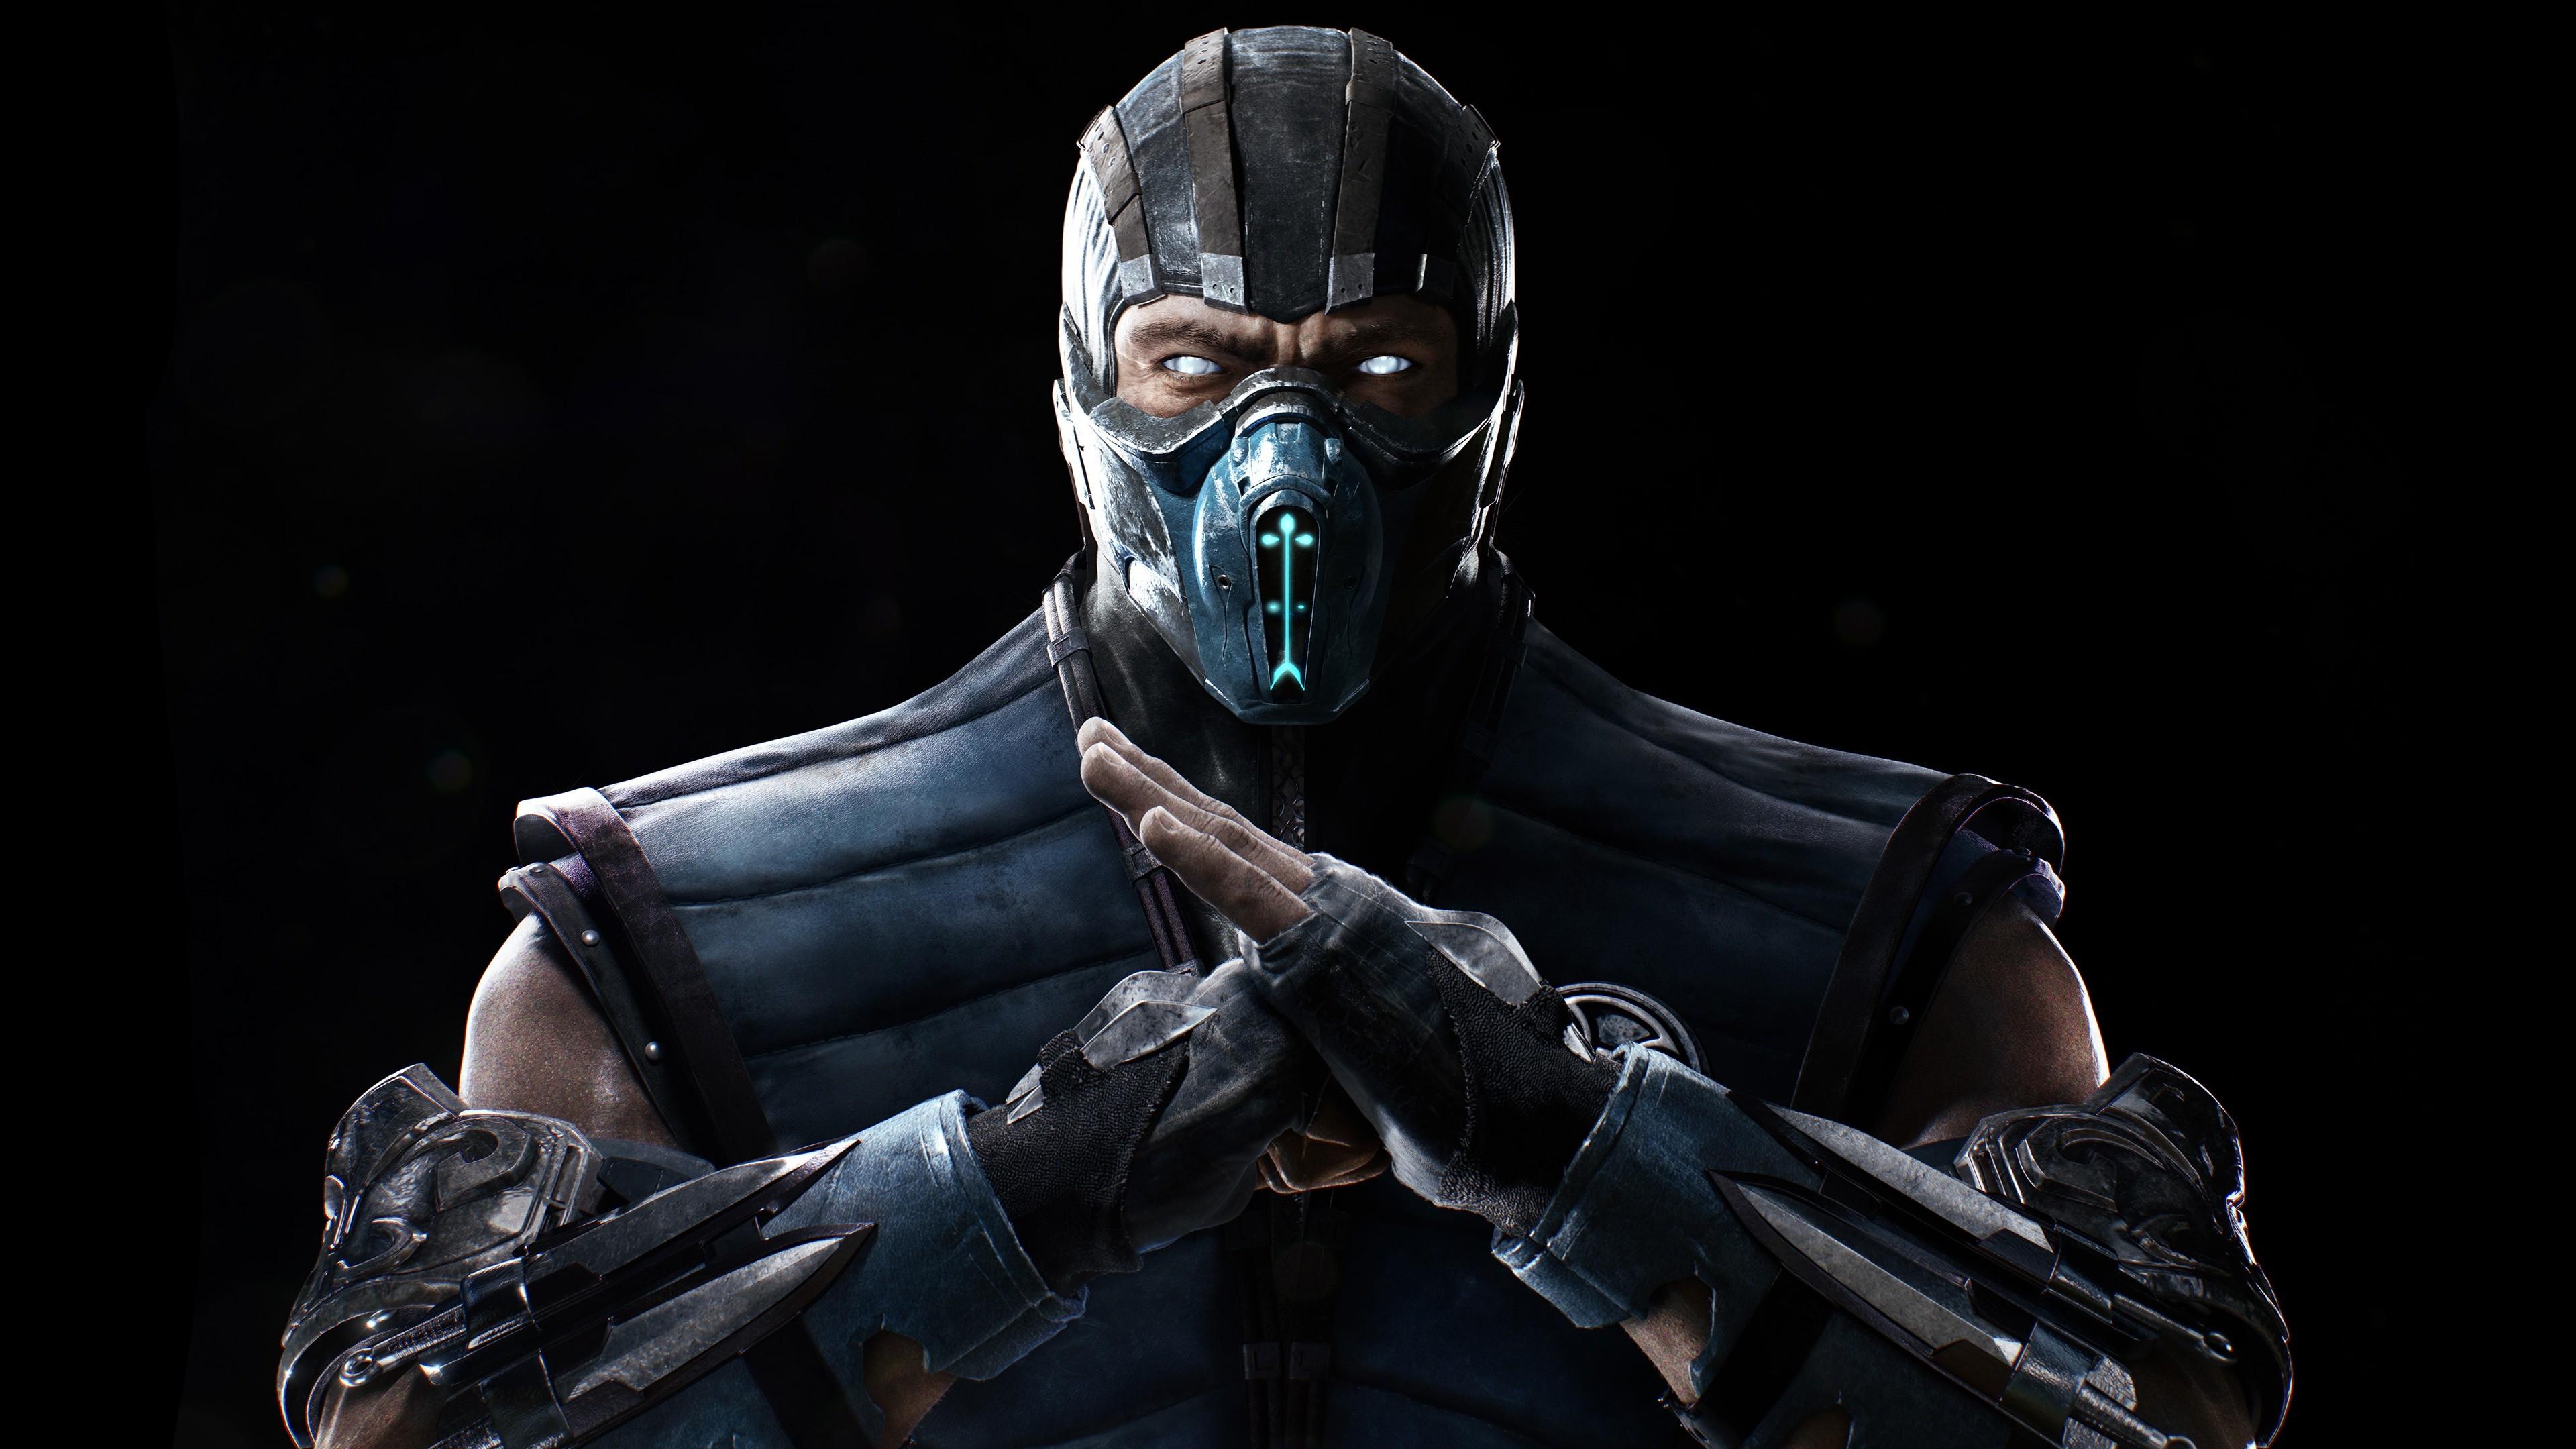 Mortal Kombat X Raiden Wallpaper Wallpapertag